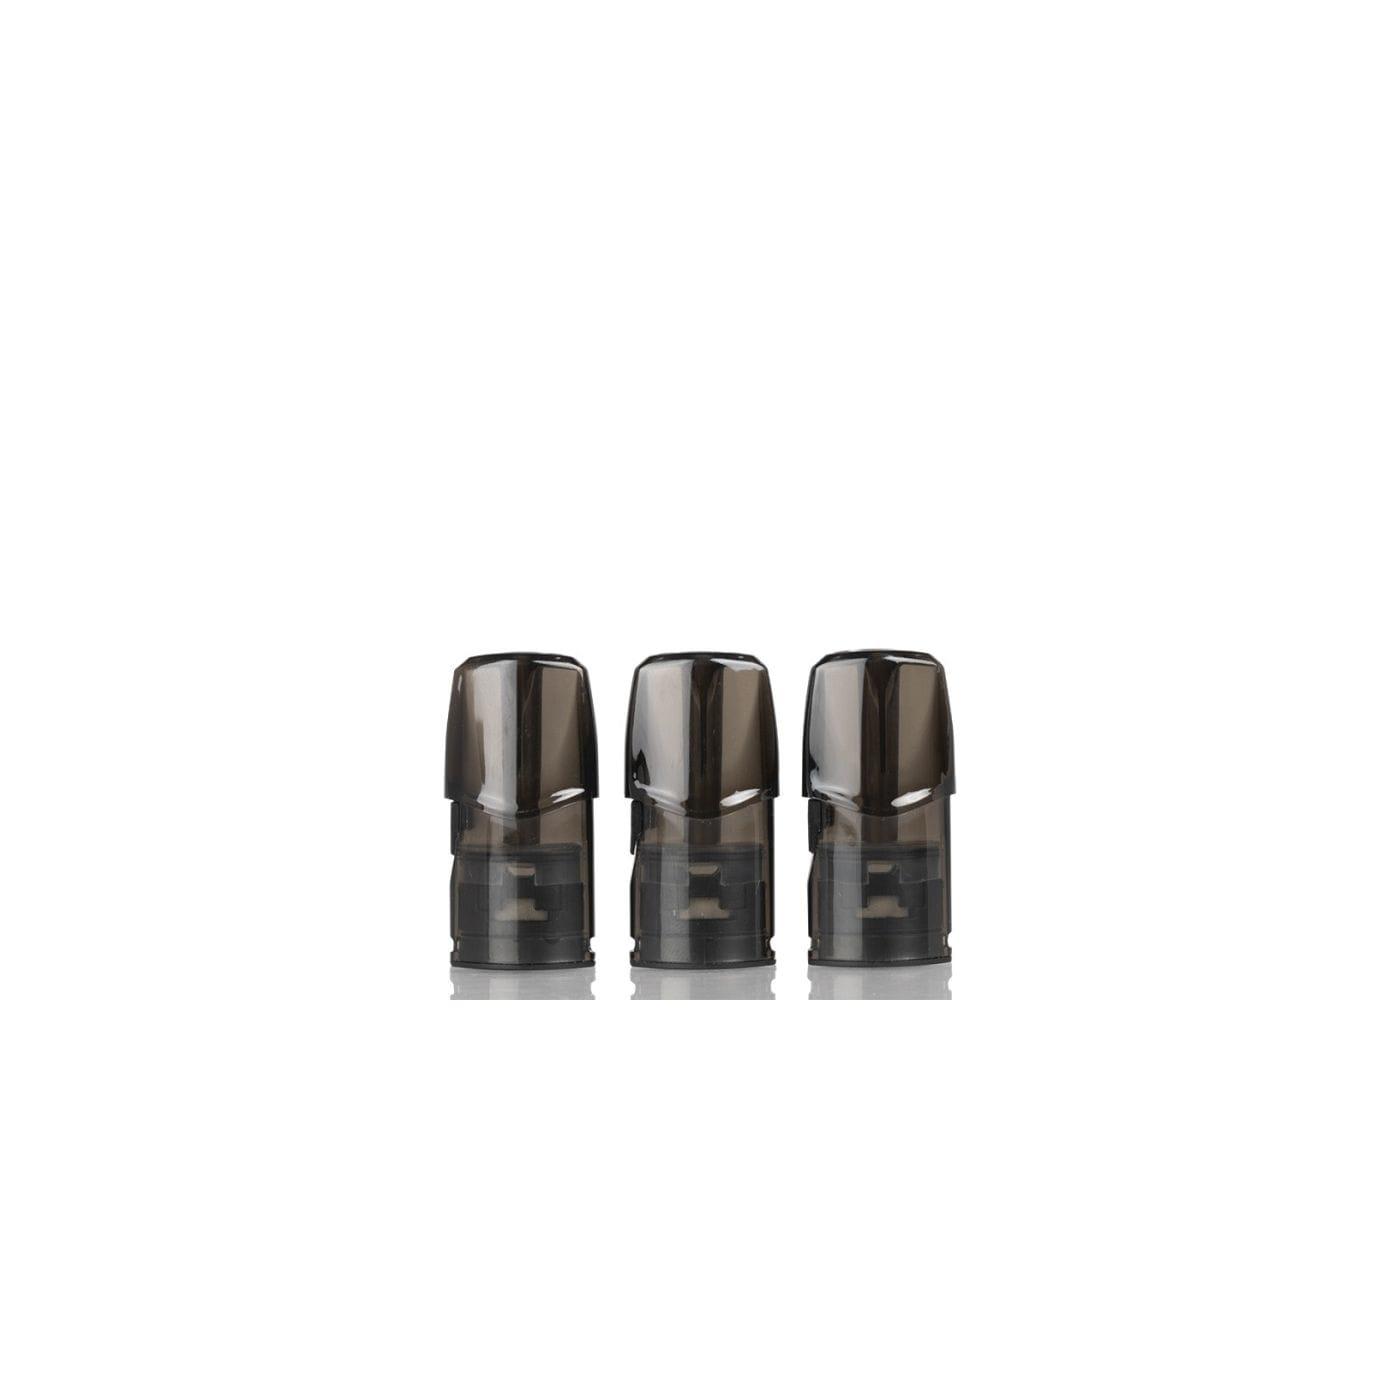 Oukitel Lark Mesh Replacement Pod - 3 Pack